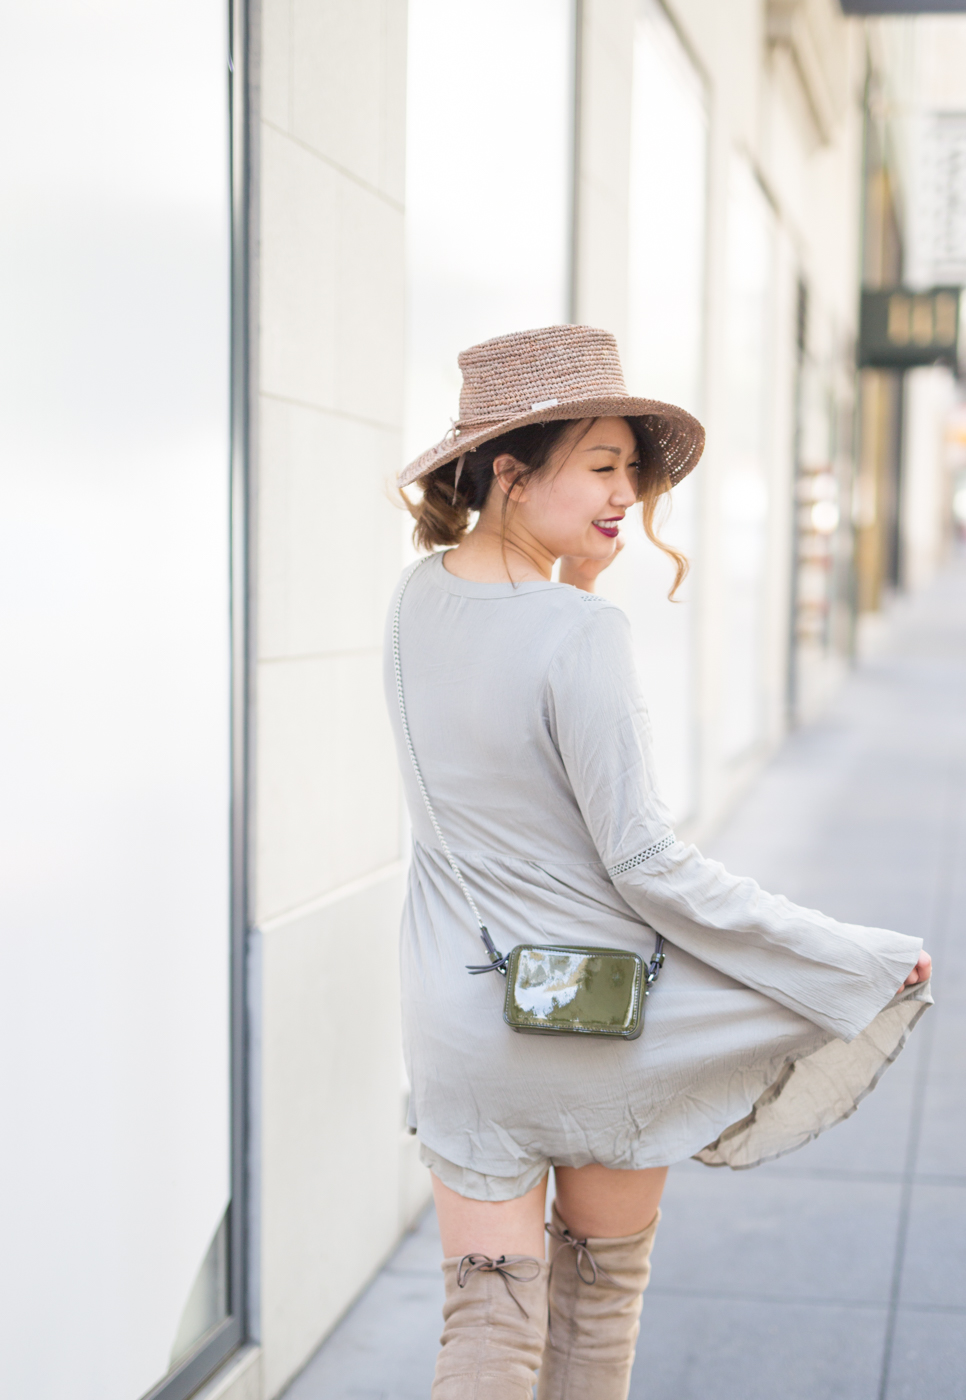 Tobi shift dress & San Diego Hat Co raffia hat   The Chic Diary